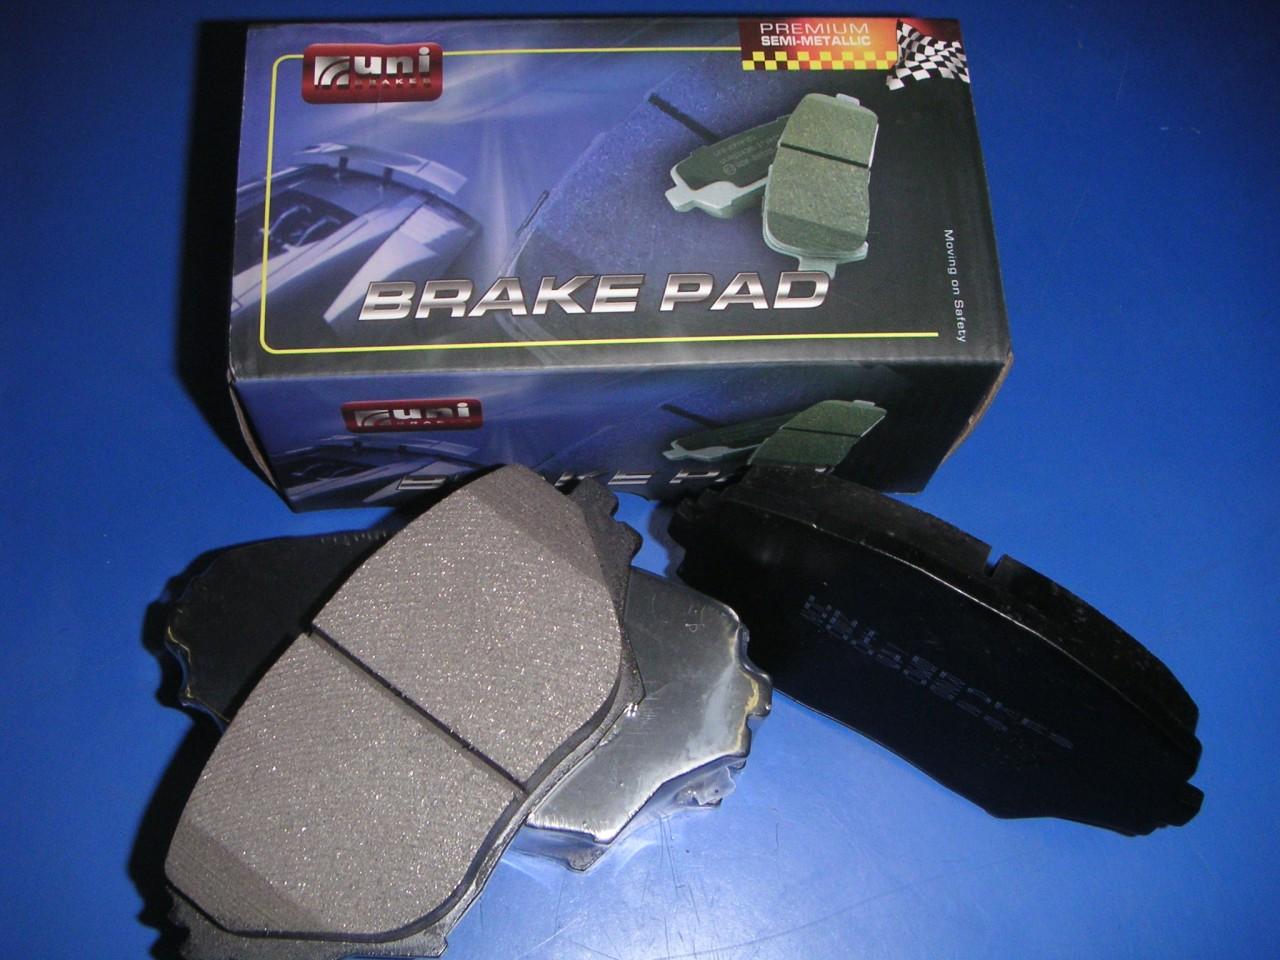 DISC-BRAKE-PADS-FRONT-Nissan-Pulsar-N15-DB1302